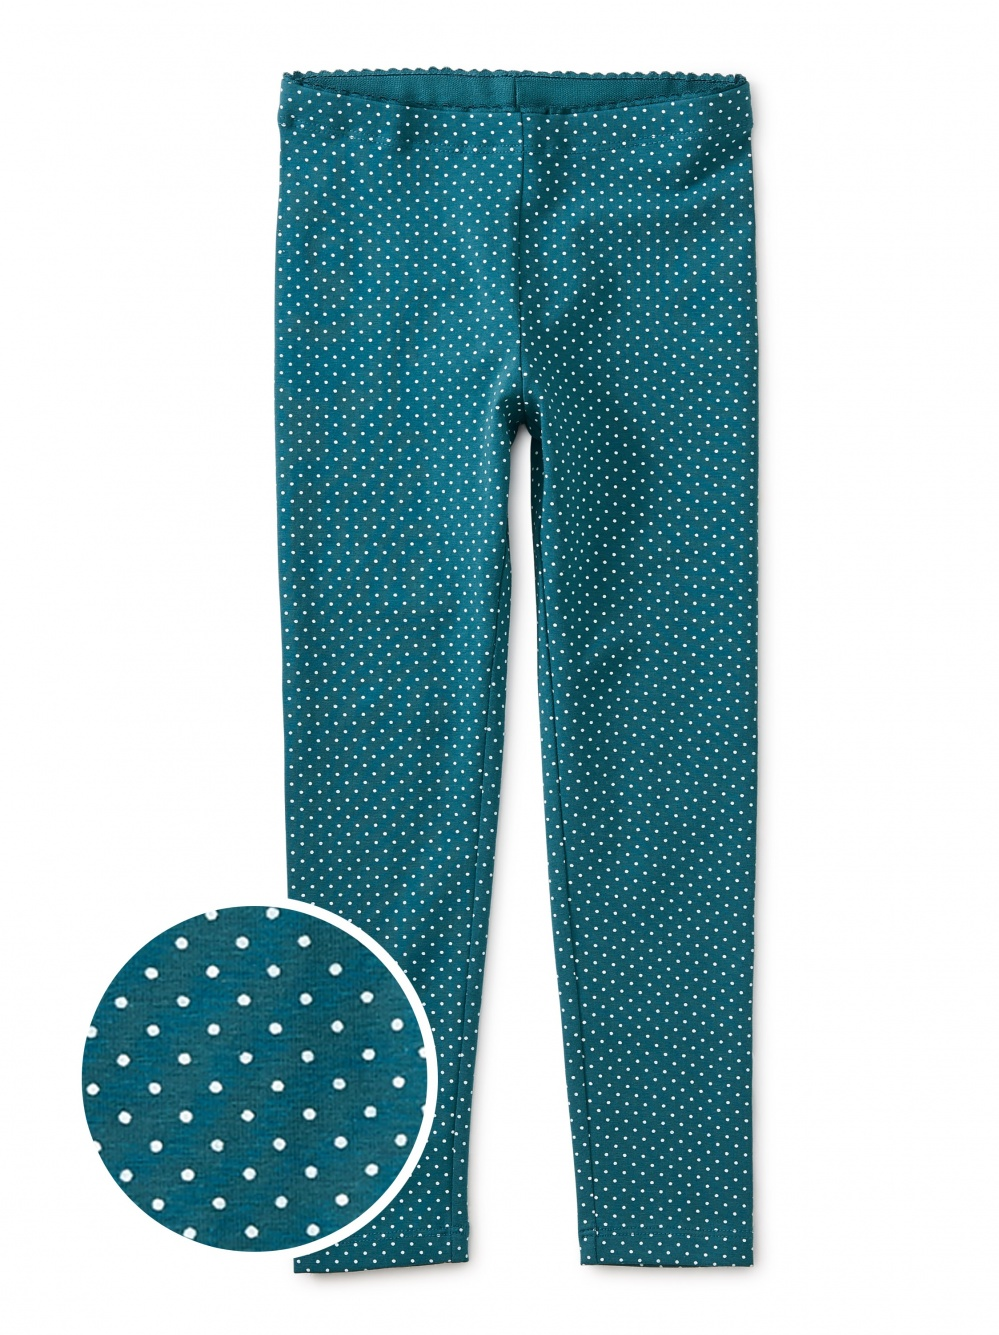 Pin Dot Leggings